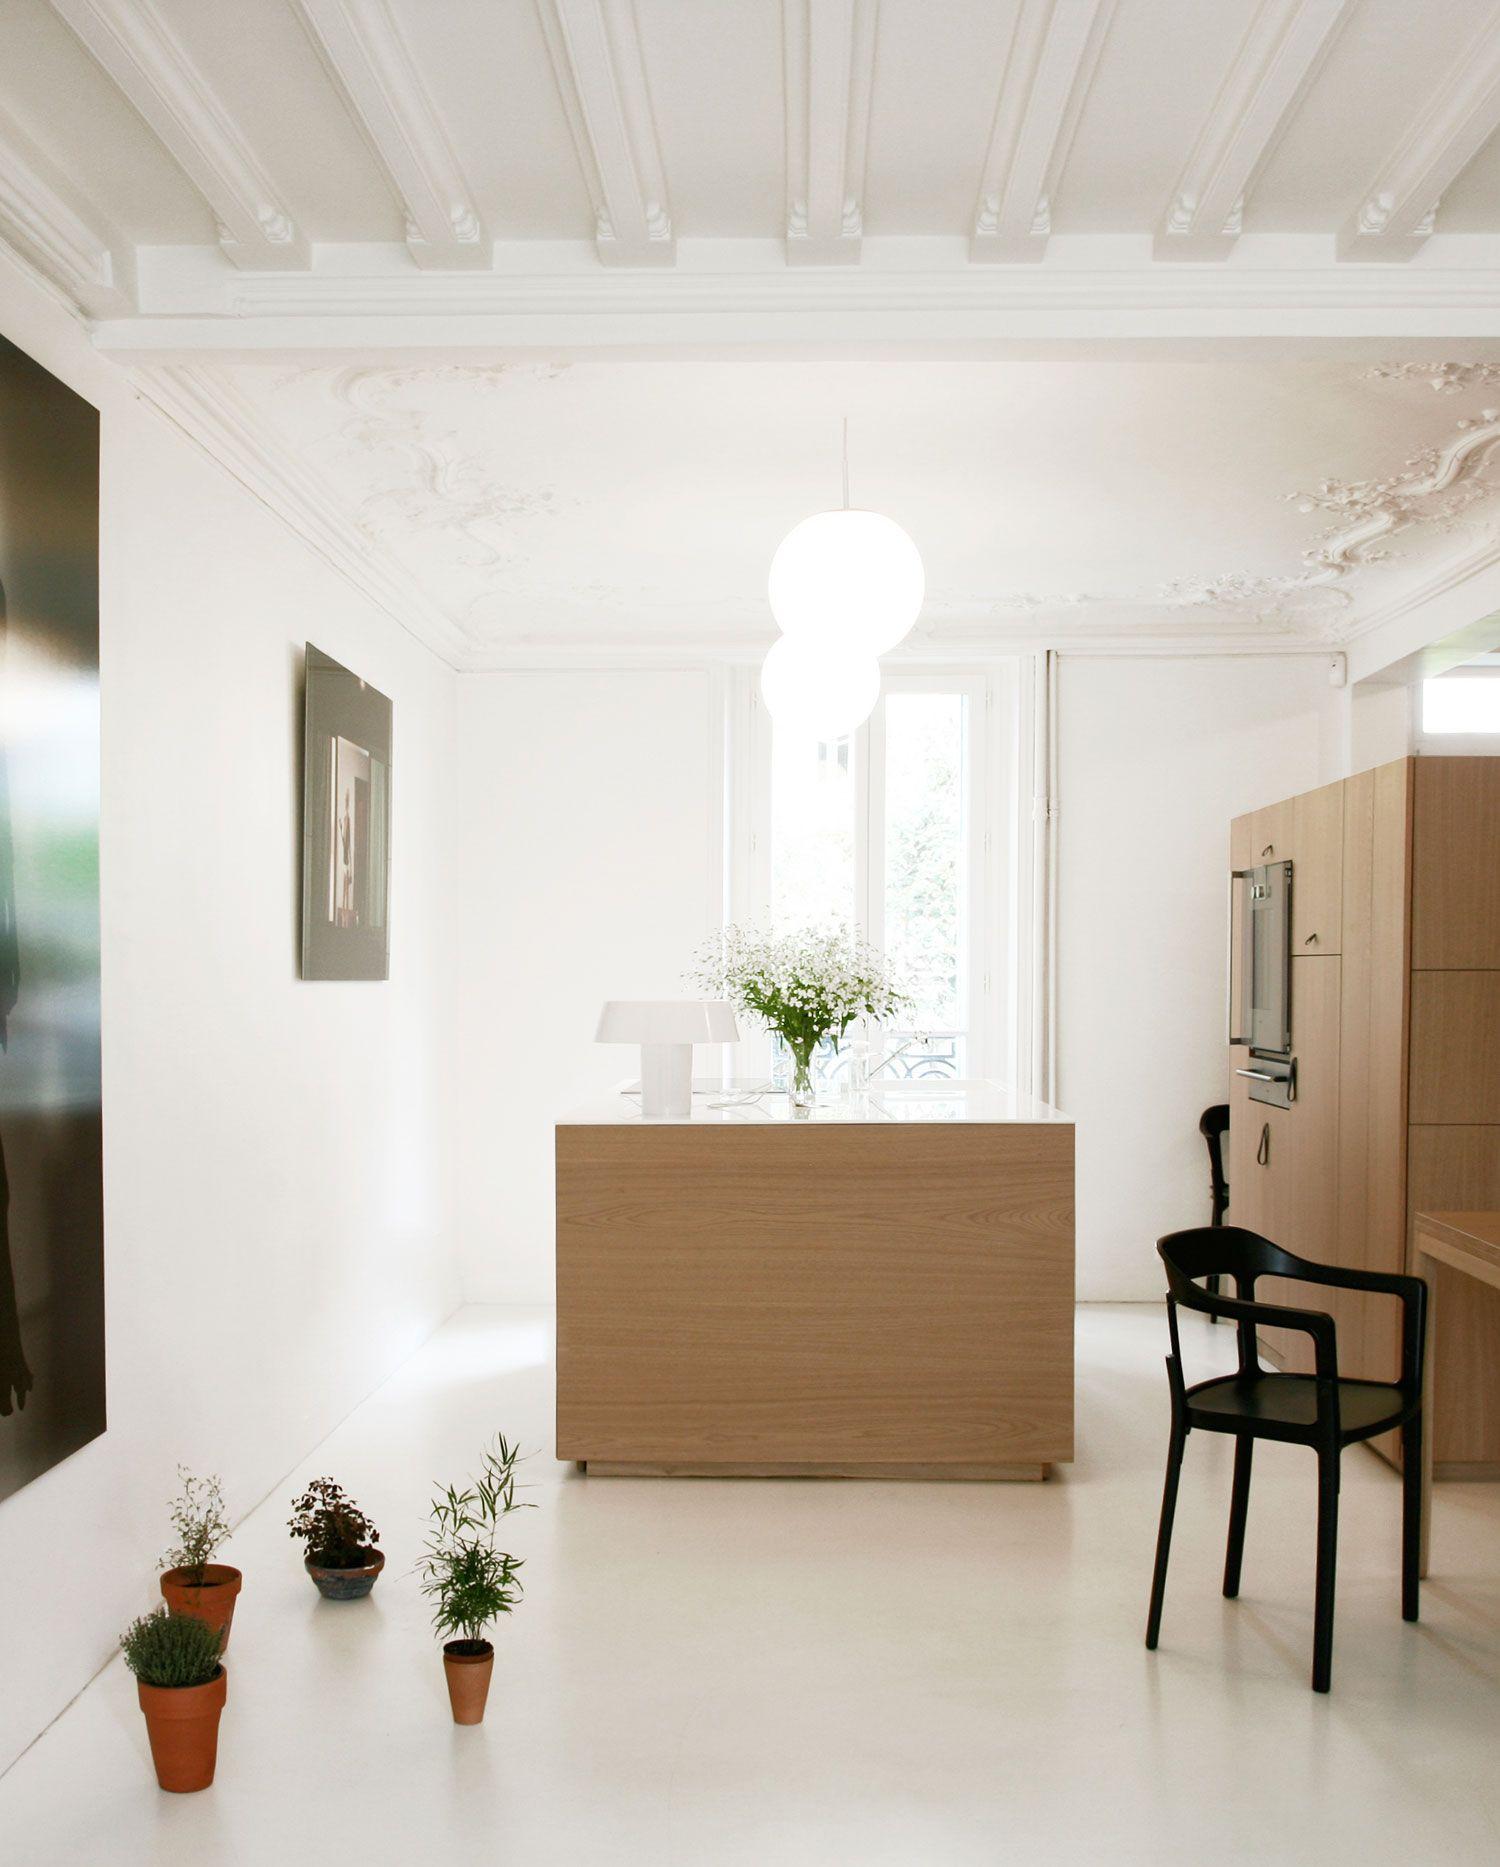 Inside an Avant-Garde Paris Home With Classical Details | White ...